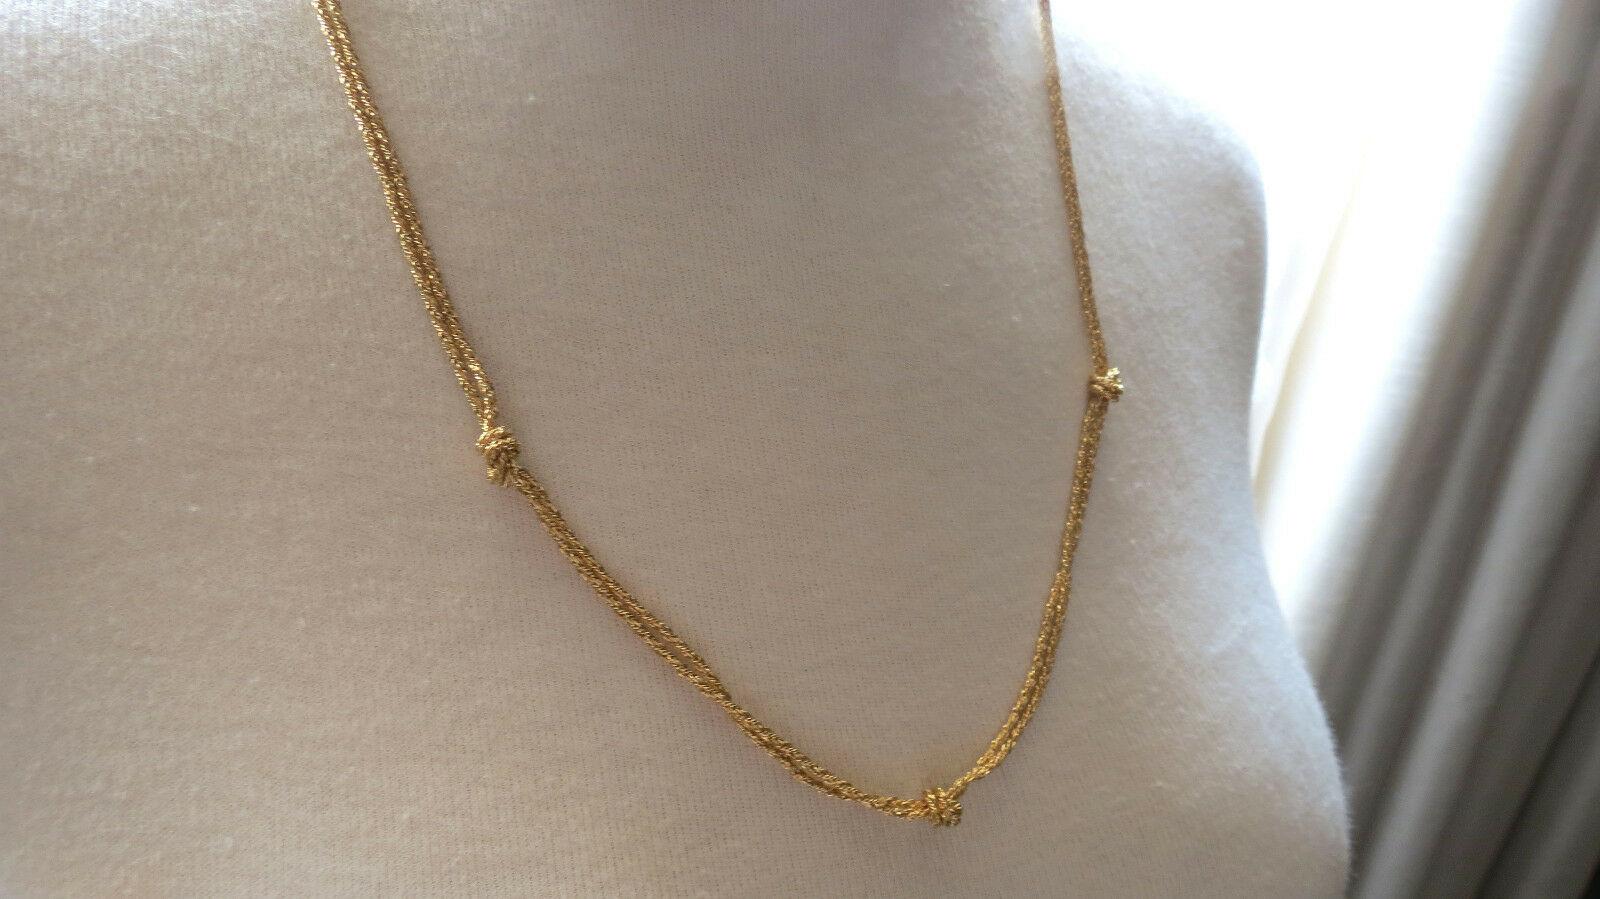 VTG Monet Designer Gold Plated Chain Necklace Knots Foil Weave Lobster Catch Wow